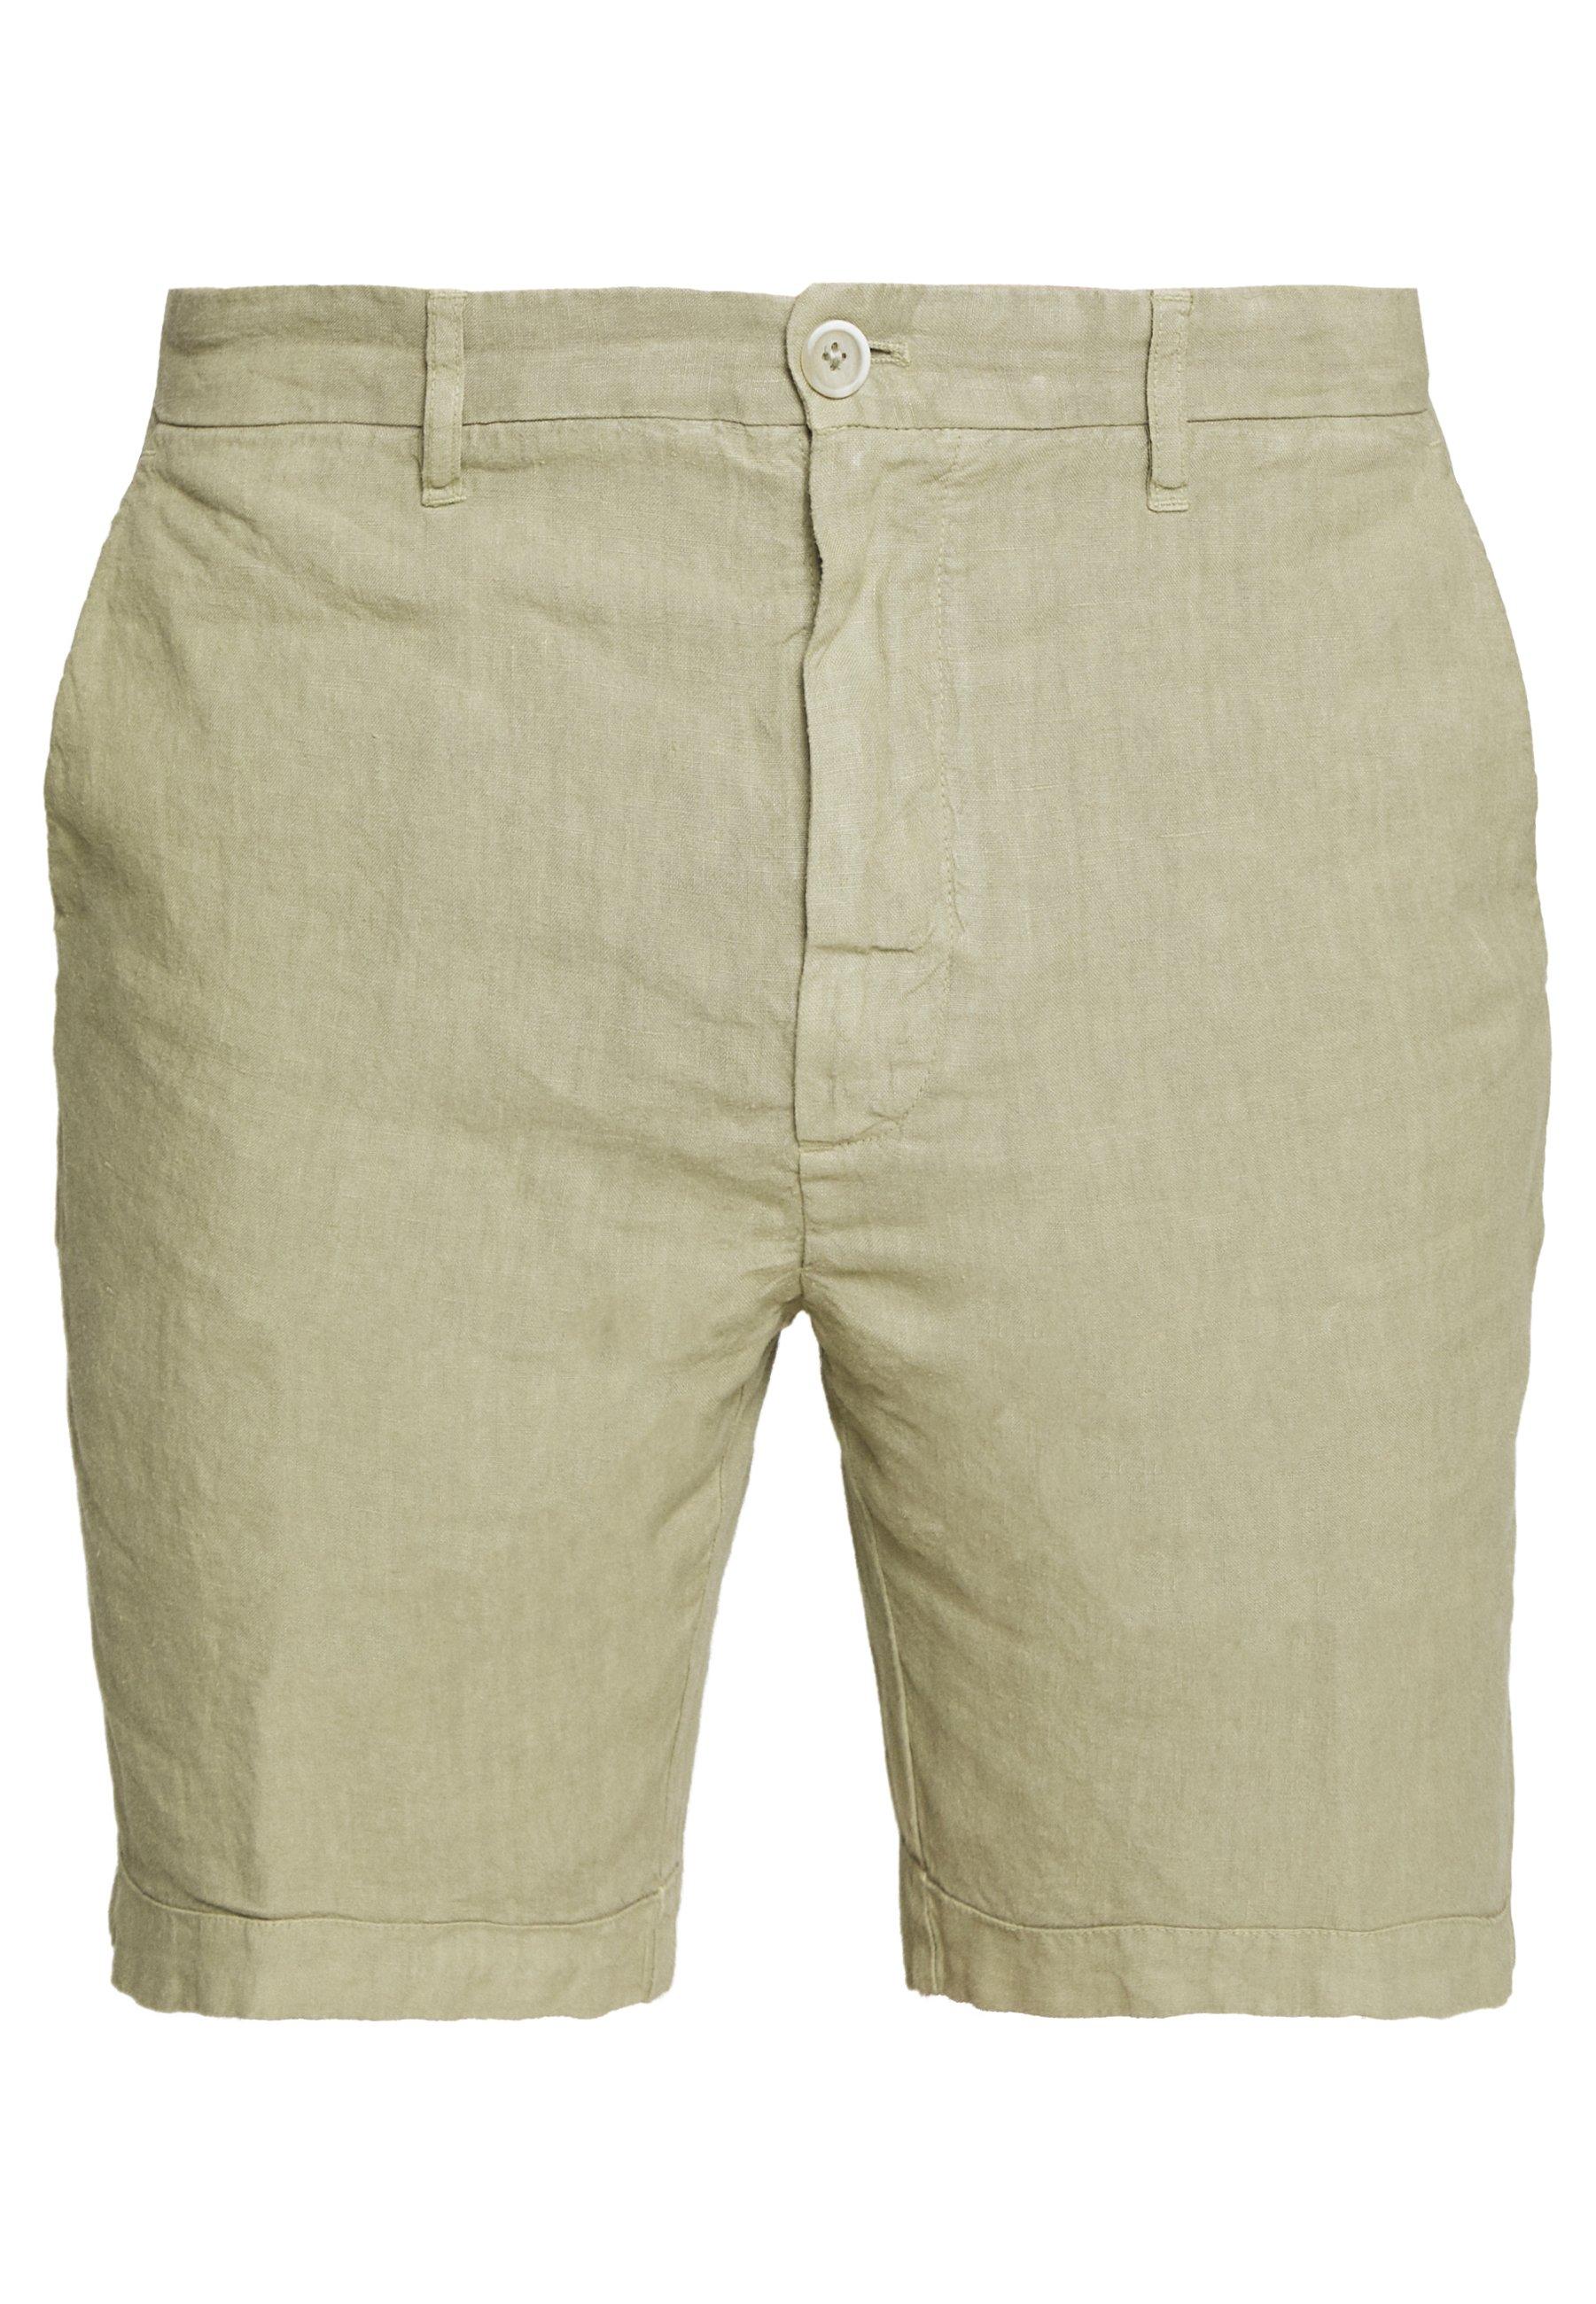 120% Lino Shorts - Olive